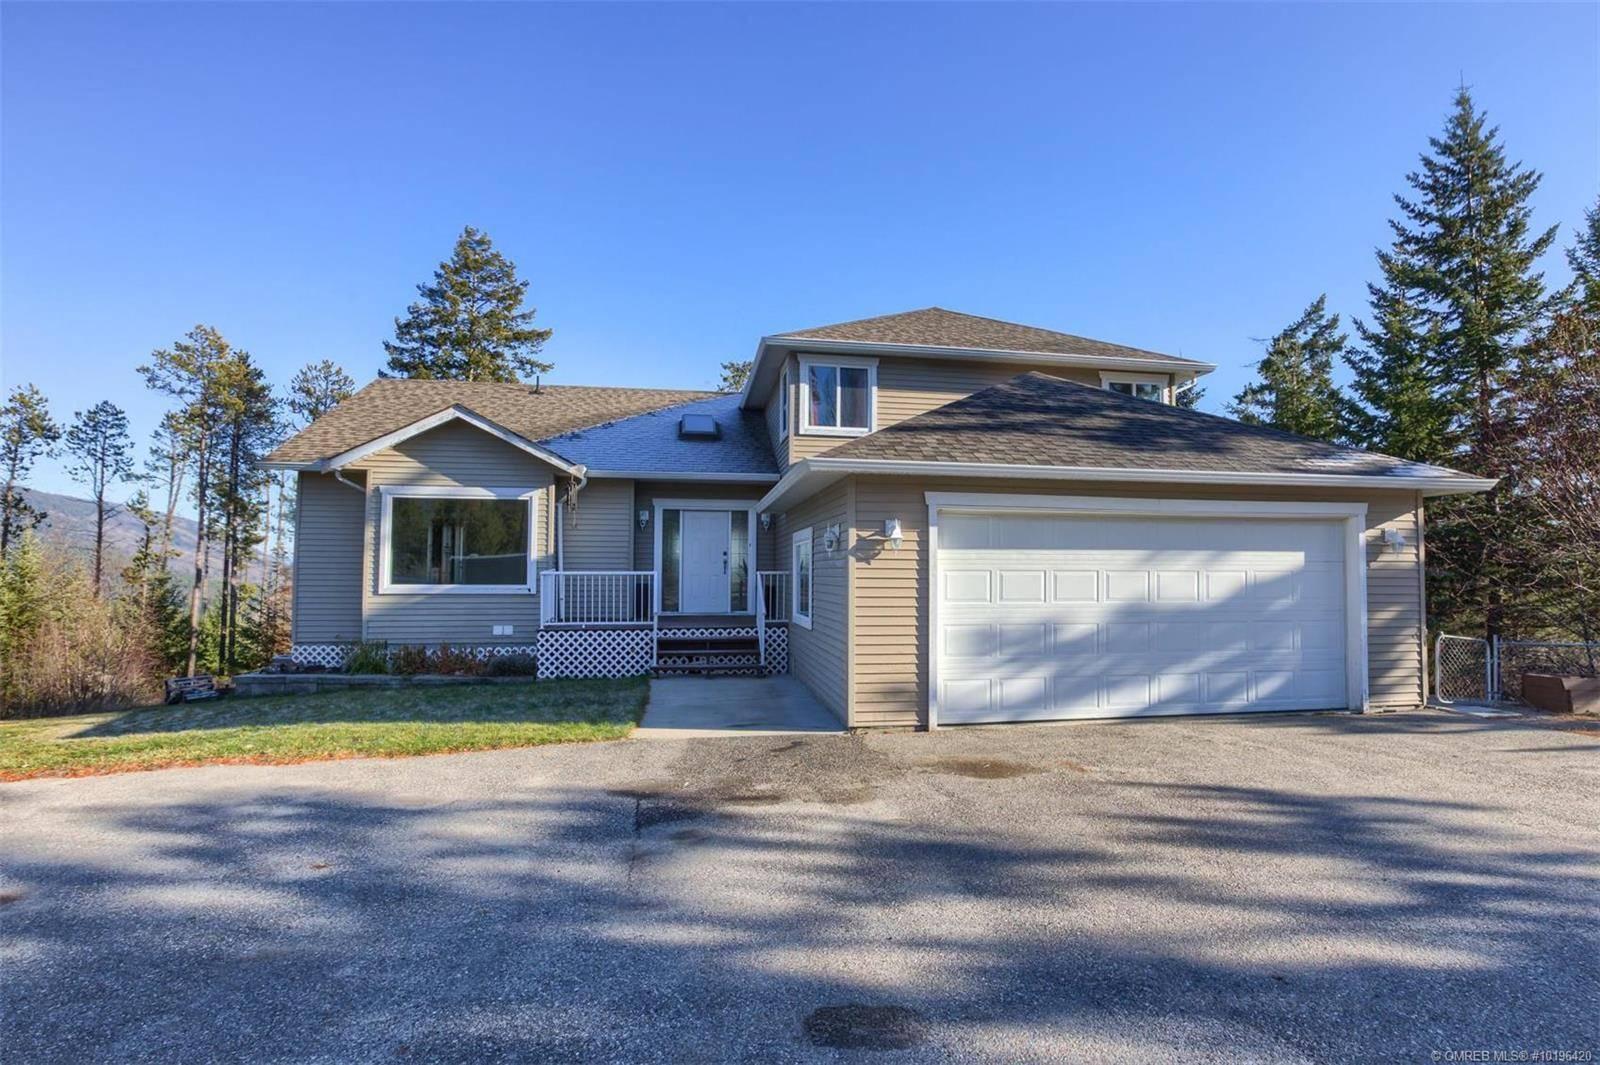 House for sale at 3313 Mckellar Rd West Kelowna British Columbia - MLS: 10196420